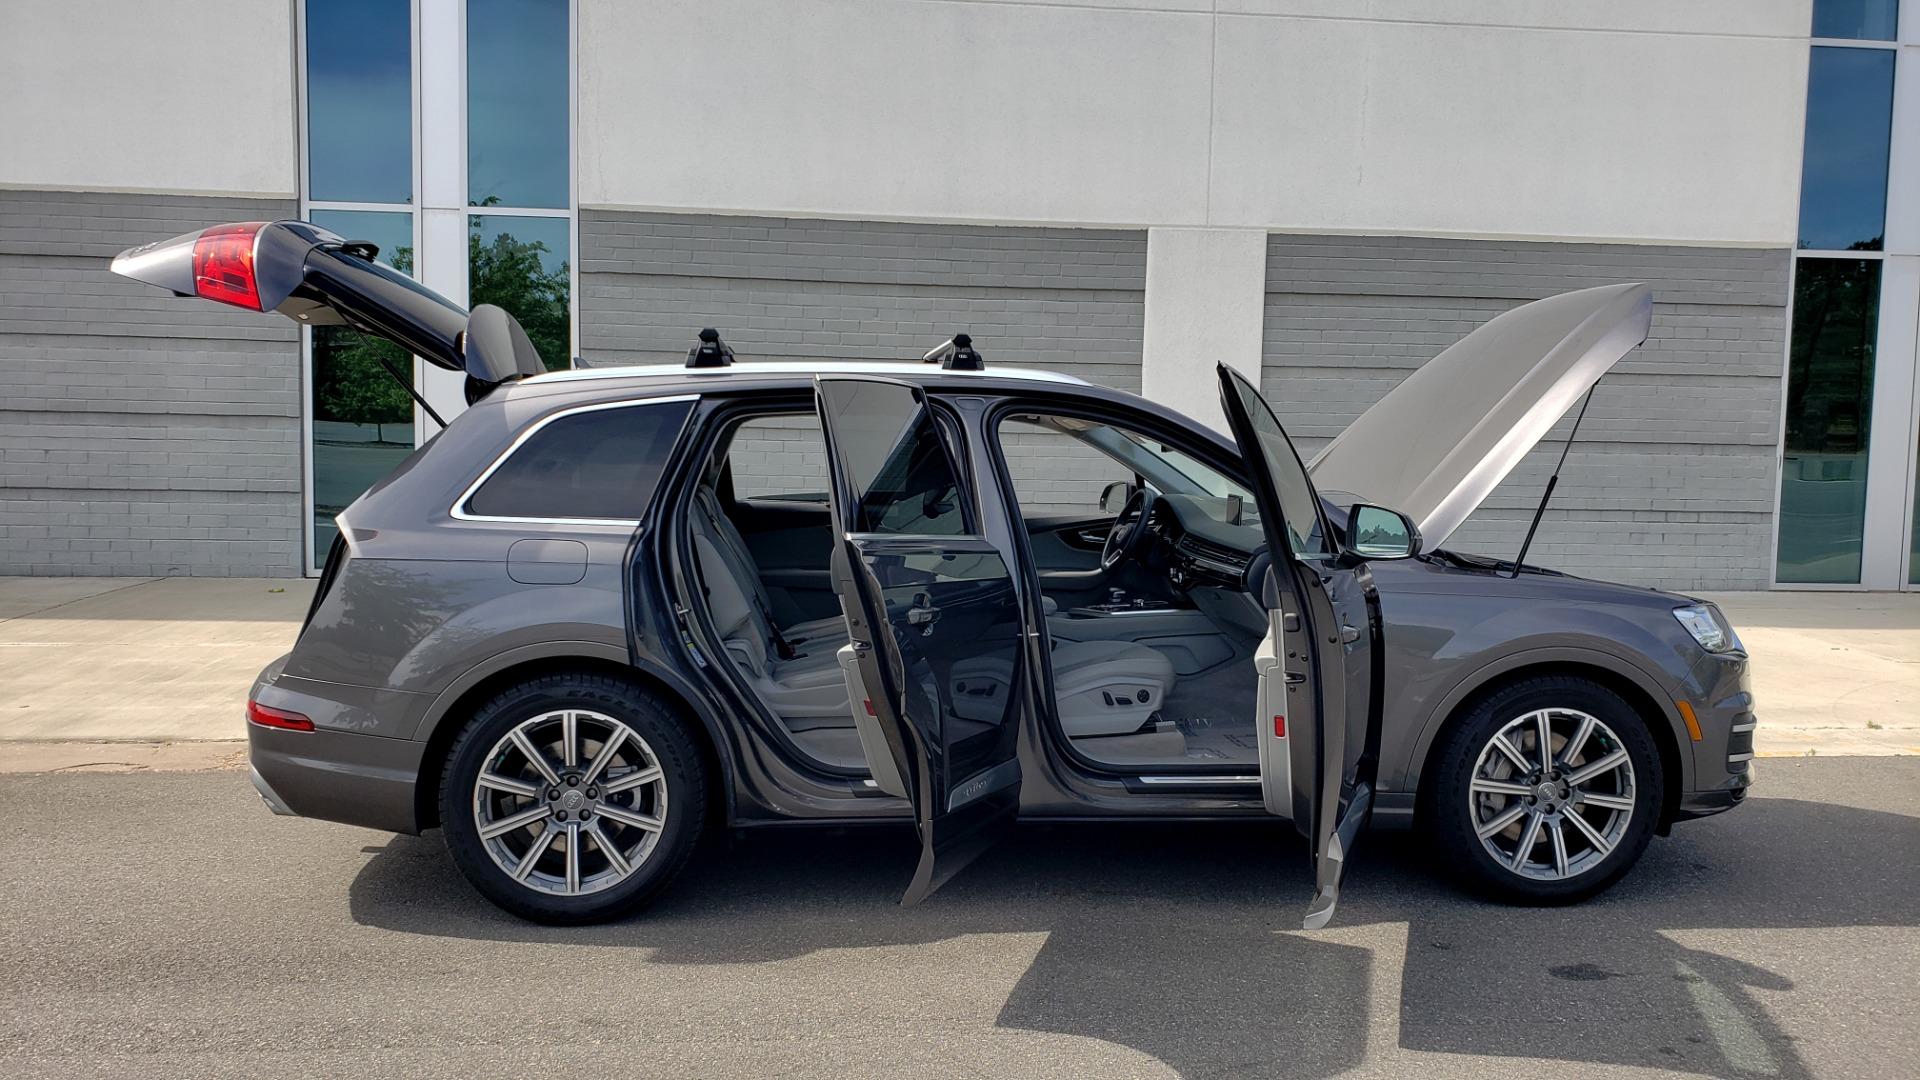 Used 2018 Audi Q7 PRESTIGE TIPTRONIC / NAV / SUNROOF / ADAPTIVE PKG / DRVR ASST / CLD WTHR /  for sale $49,995 at Formula Imports in Charlotte NC 28227 12